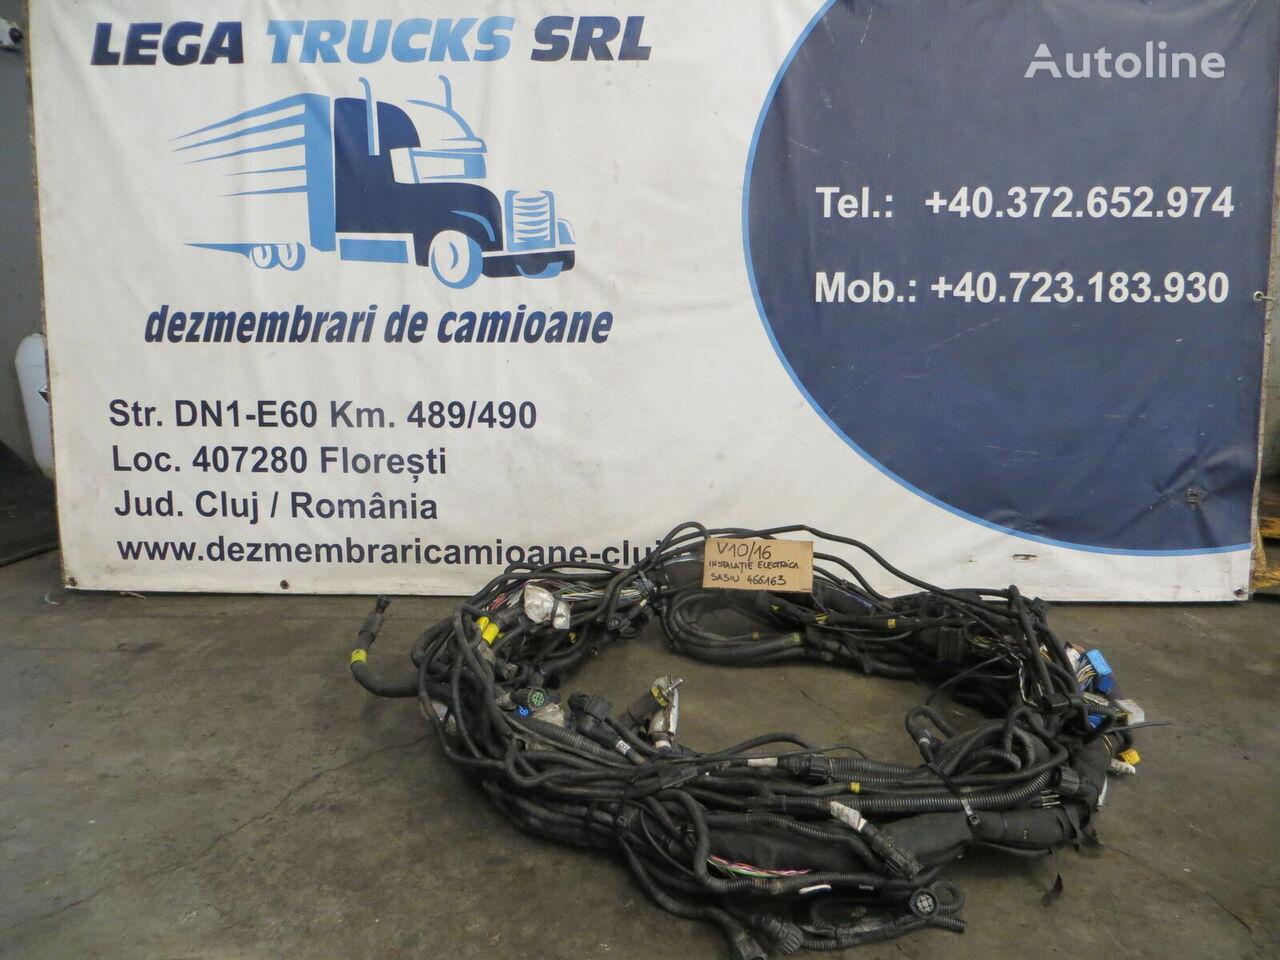 VOLVO Instalatie electrica sasiu completa / V10/16 / 20927930 20508 (V10/16) cableado para VOLVO FH tractora